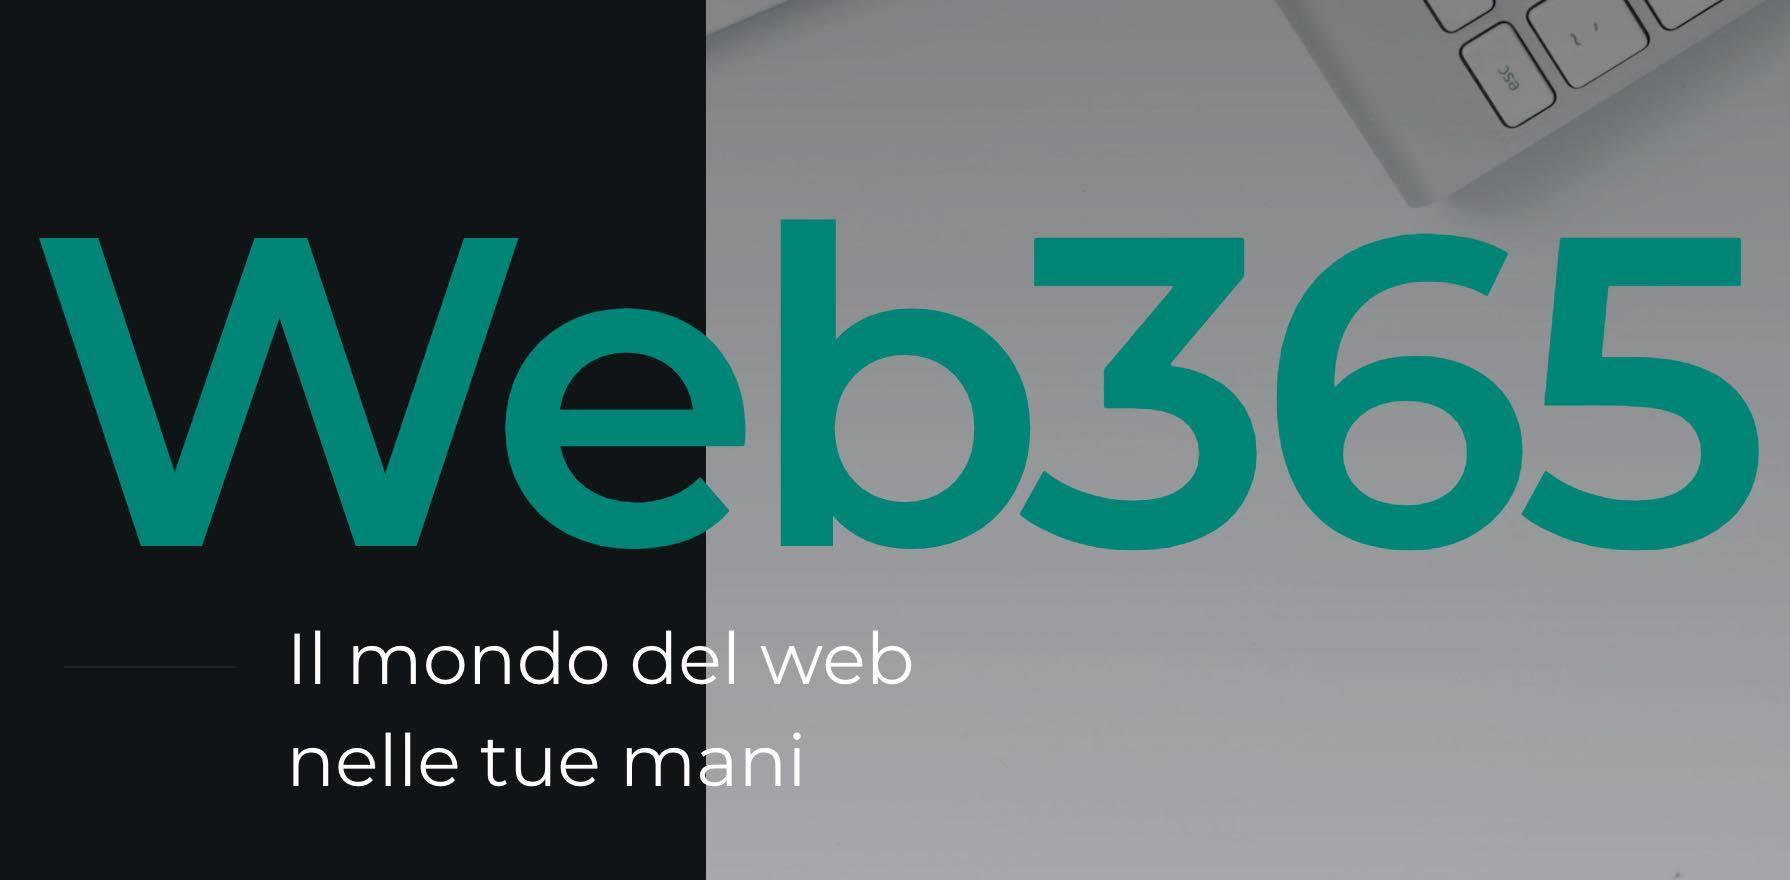 web365 network